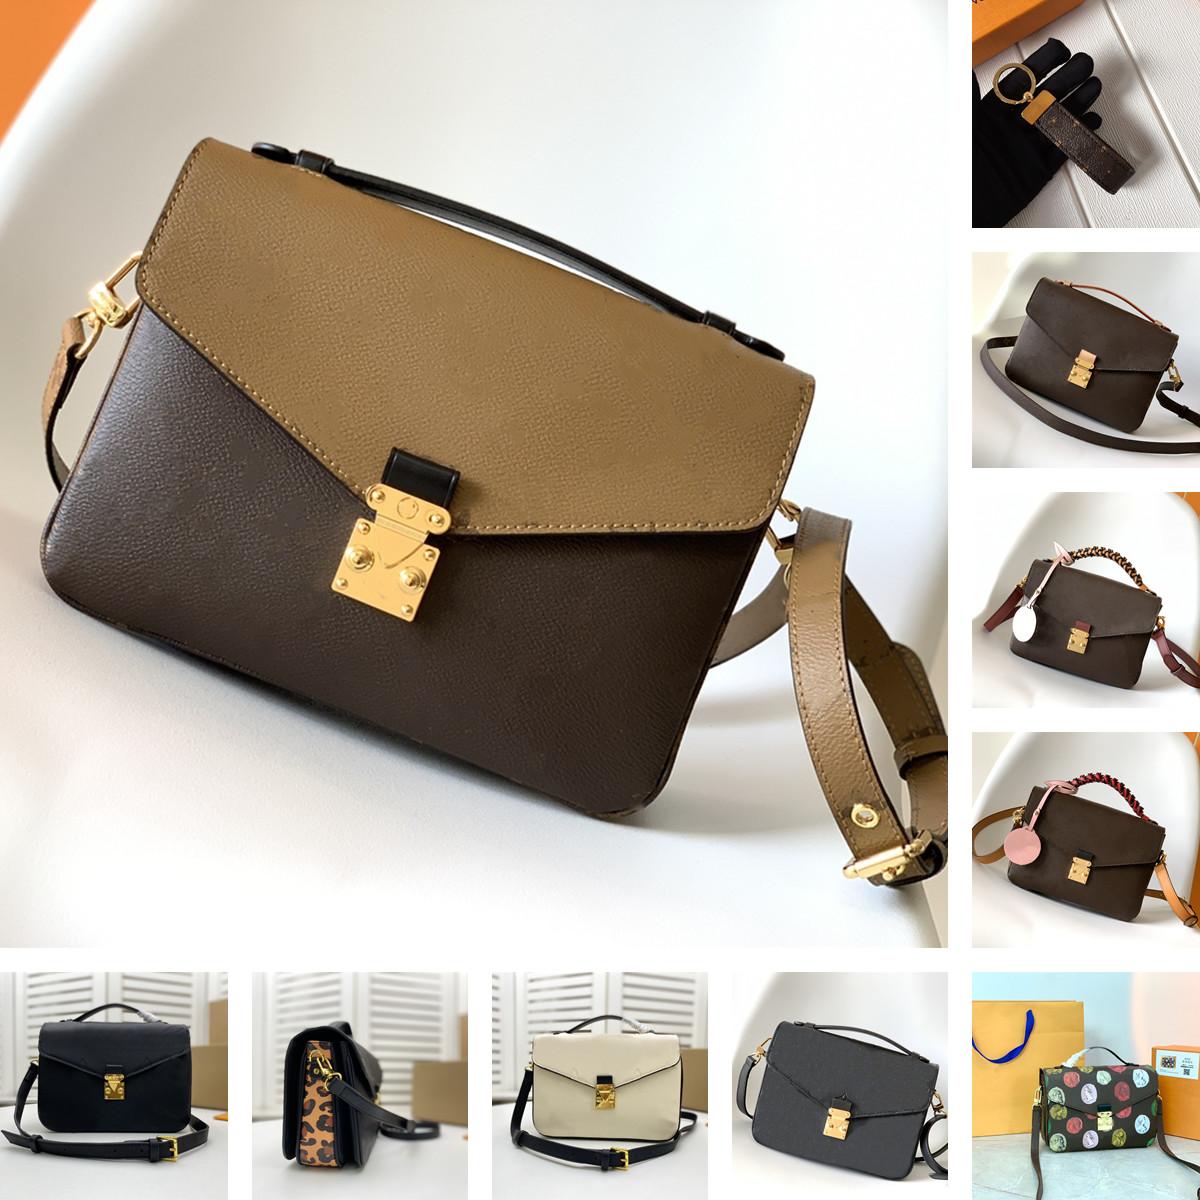 2021 Shoulder Bag Woman Sale Discount Quality Metis Handbag Genuine leather handle brand designer floral letters checkers Cross Body purse